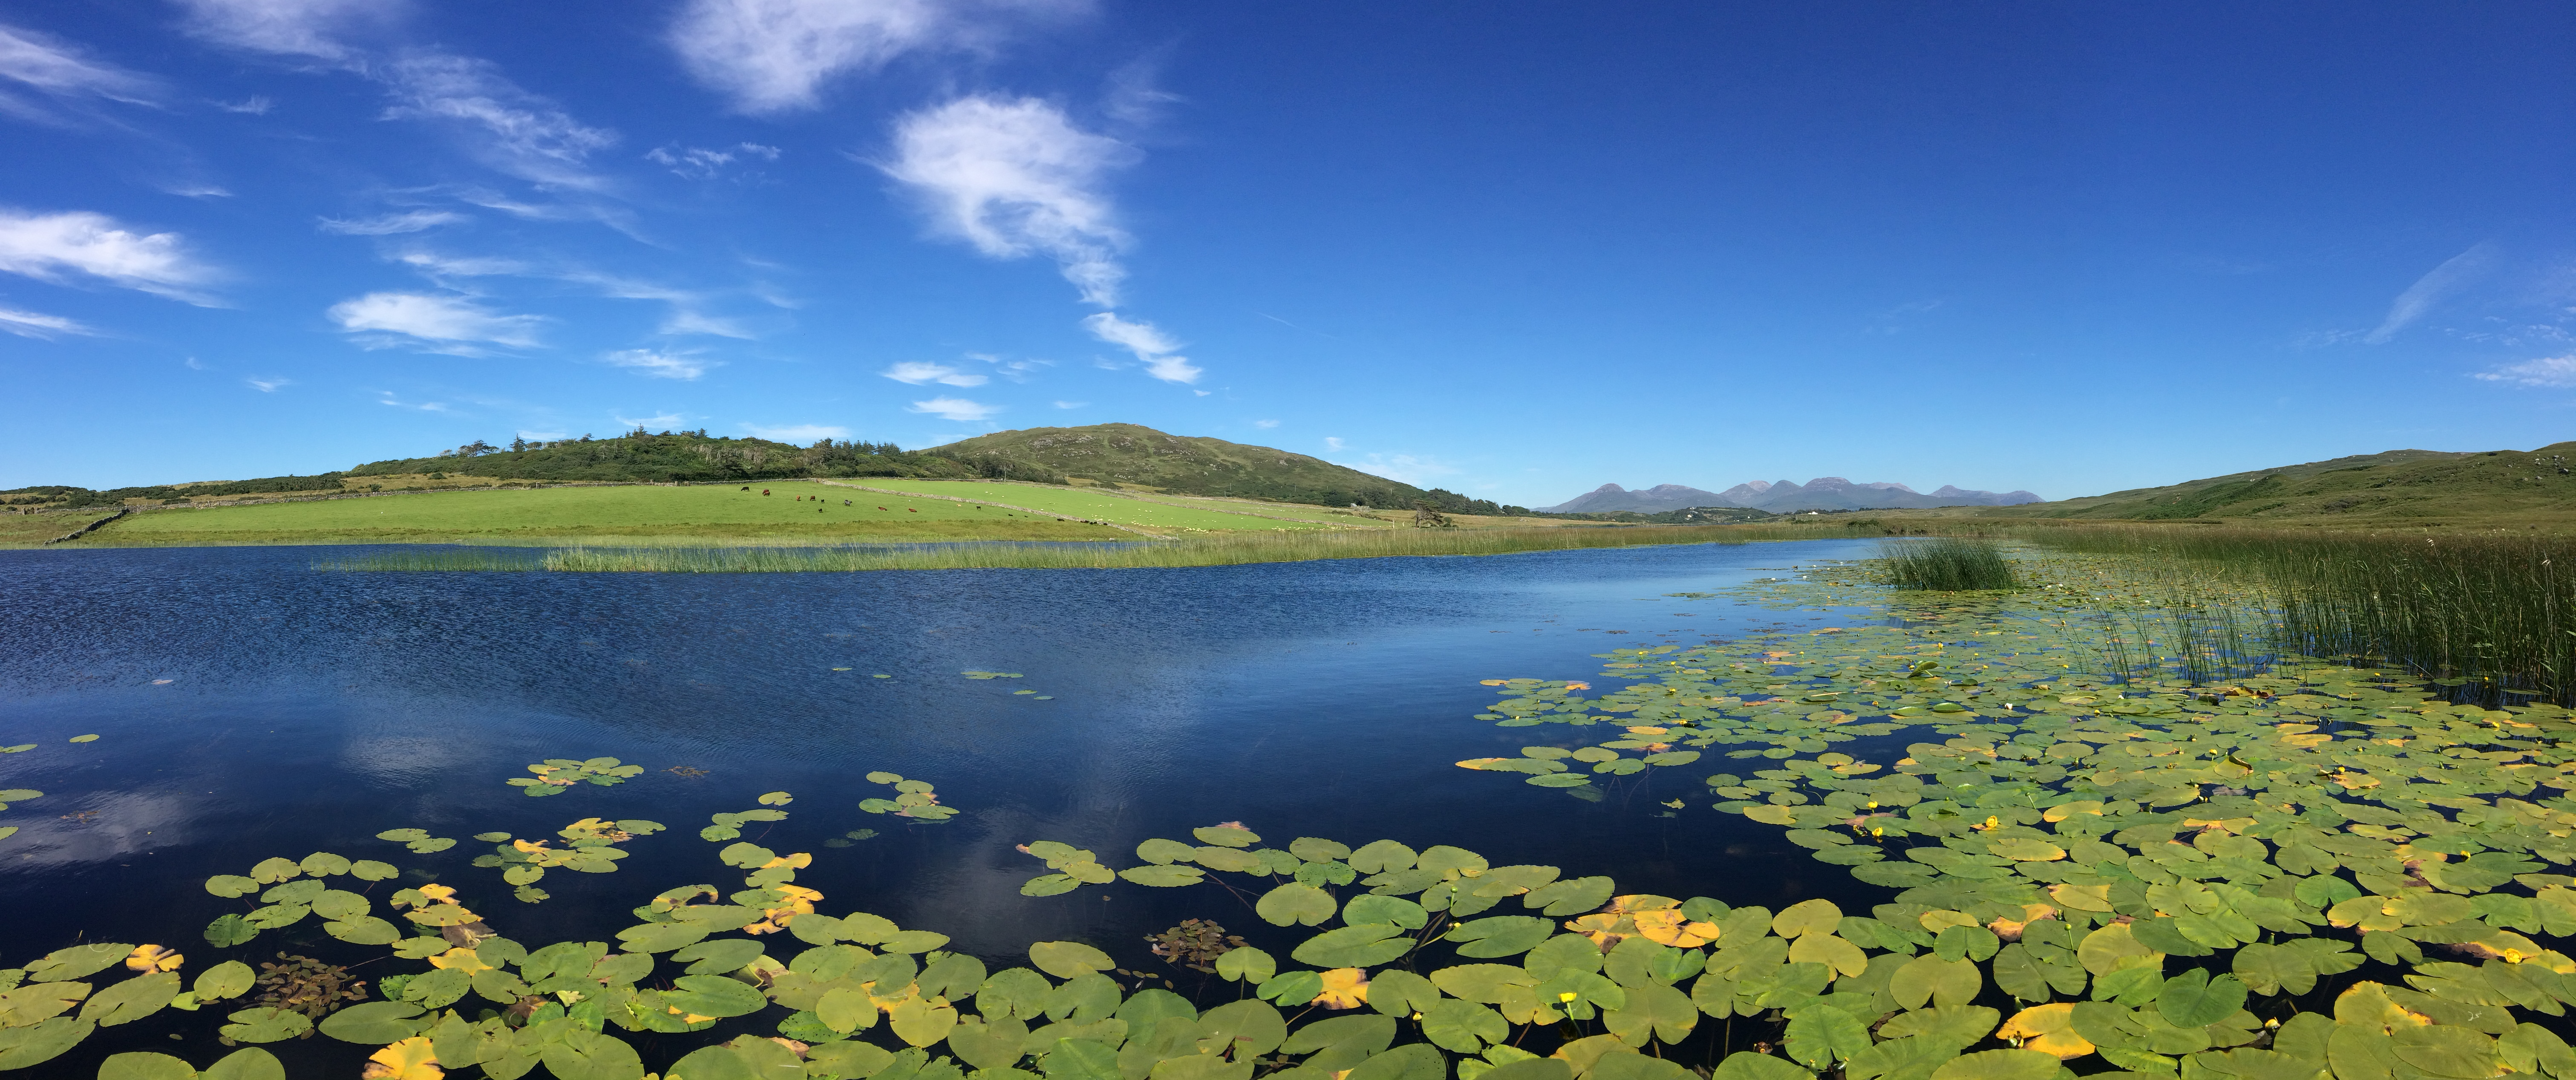 lake and  surrounding area